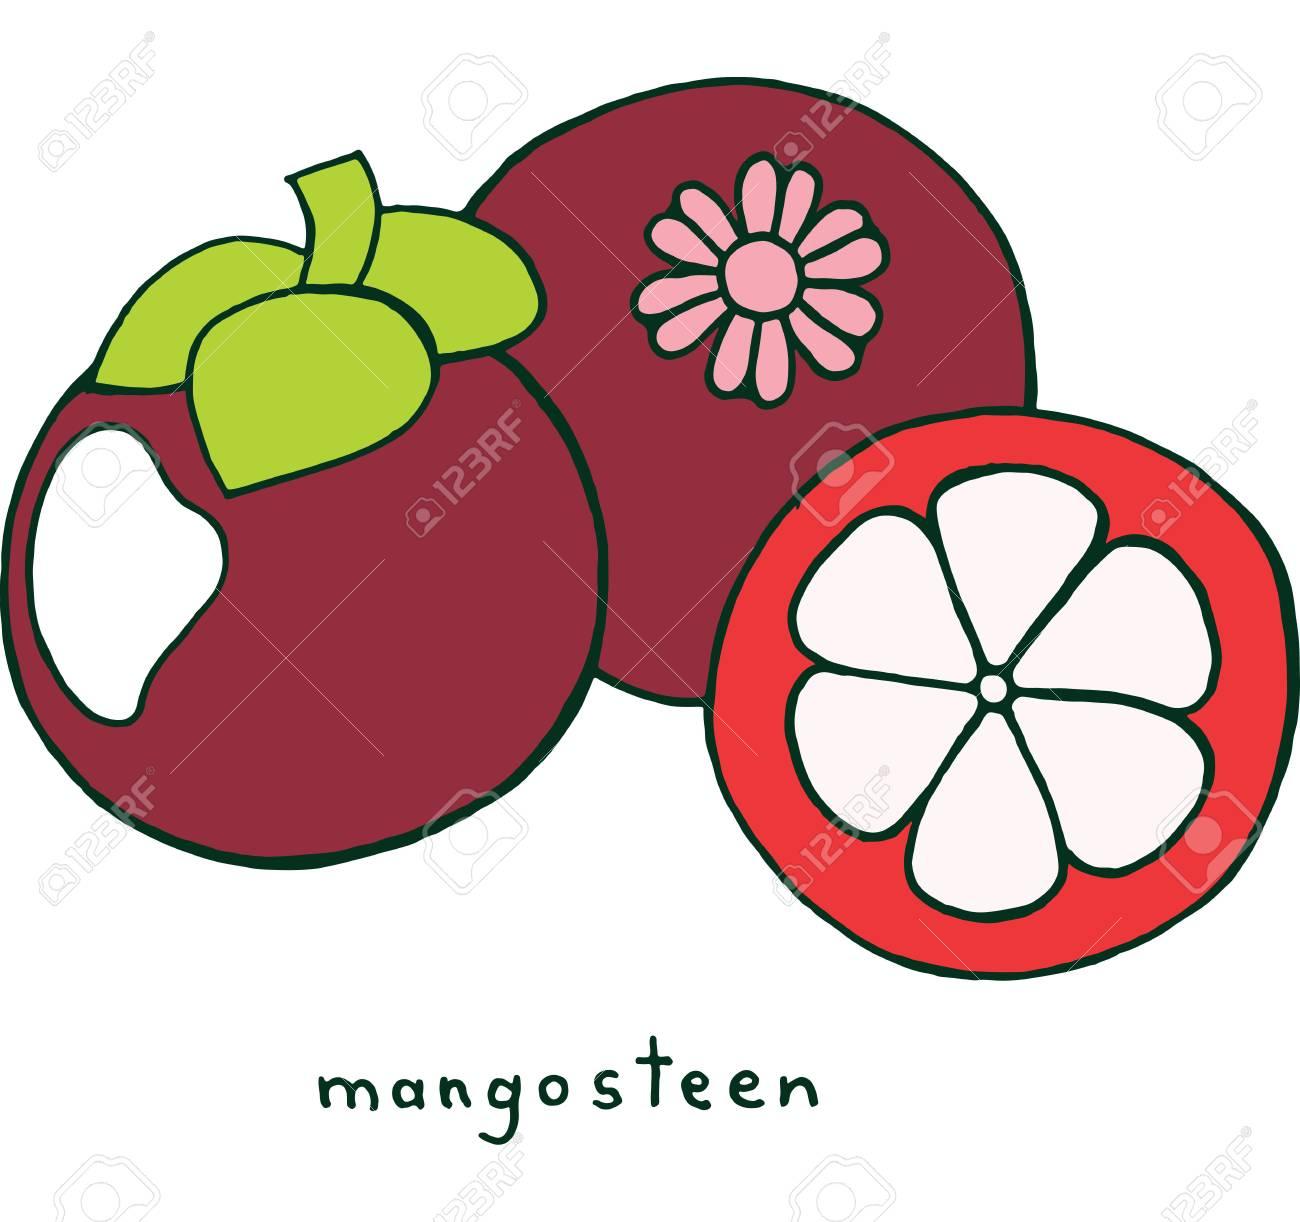 Mangosteen Fruit Images Free Download